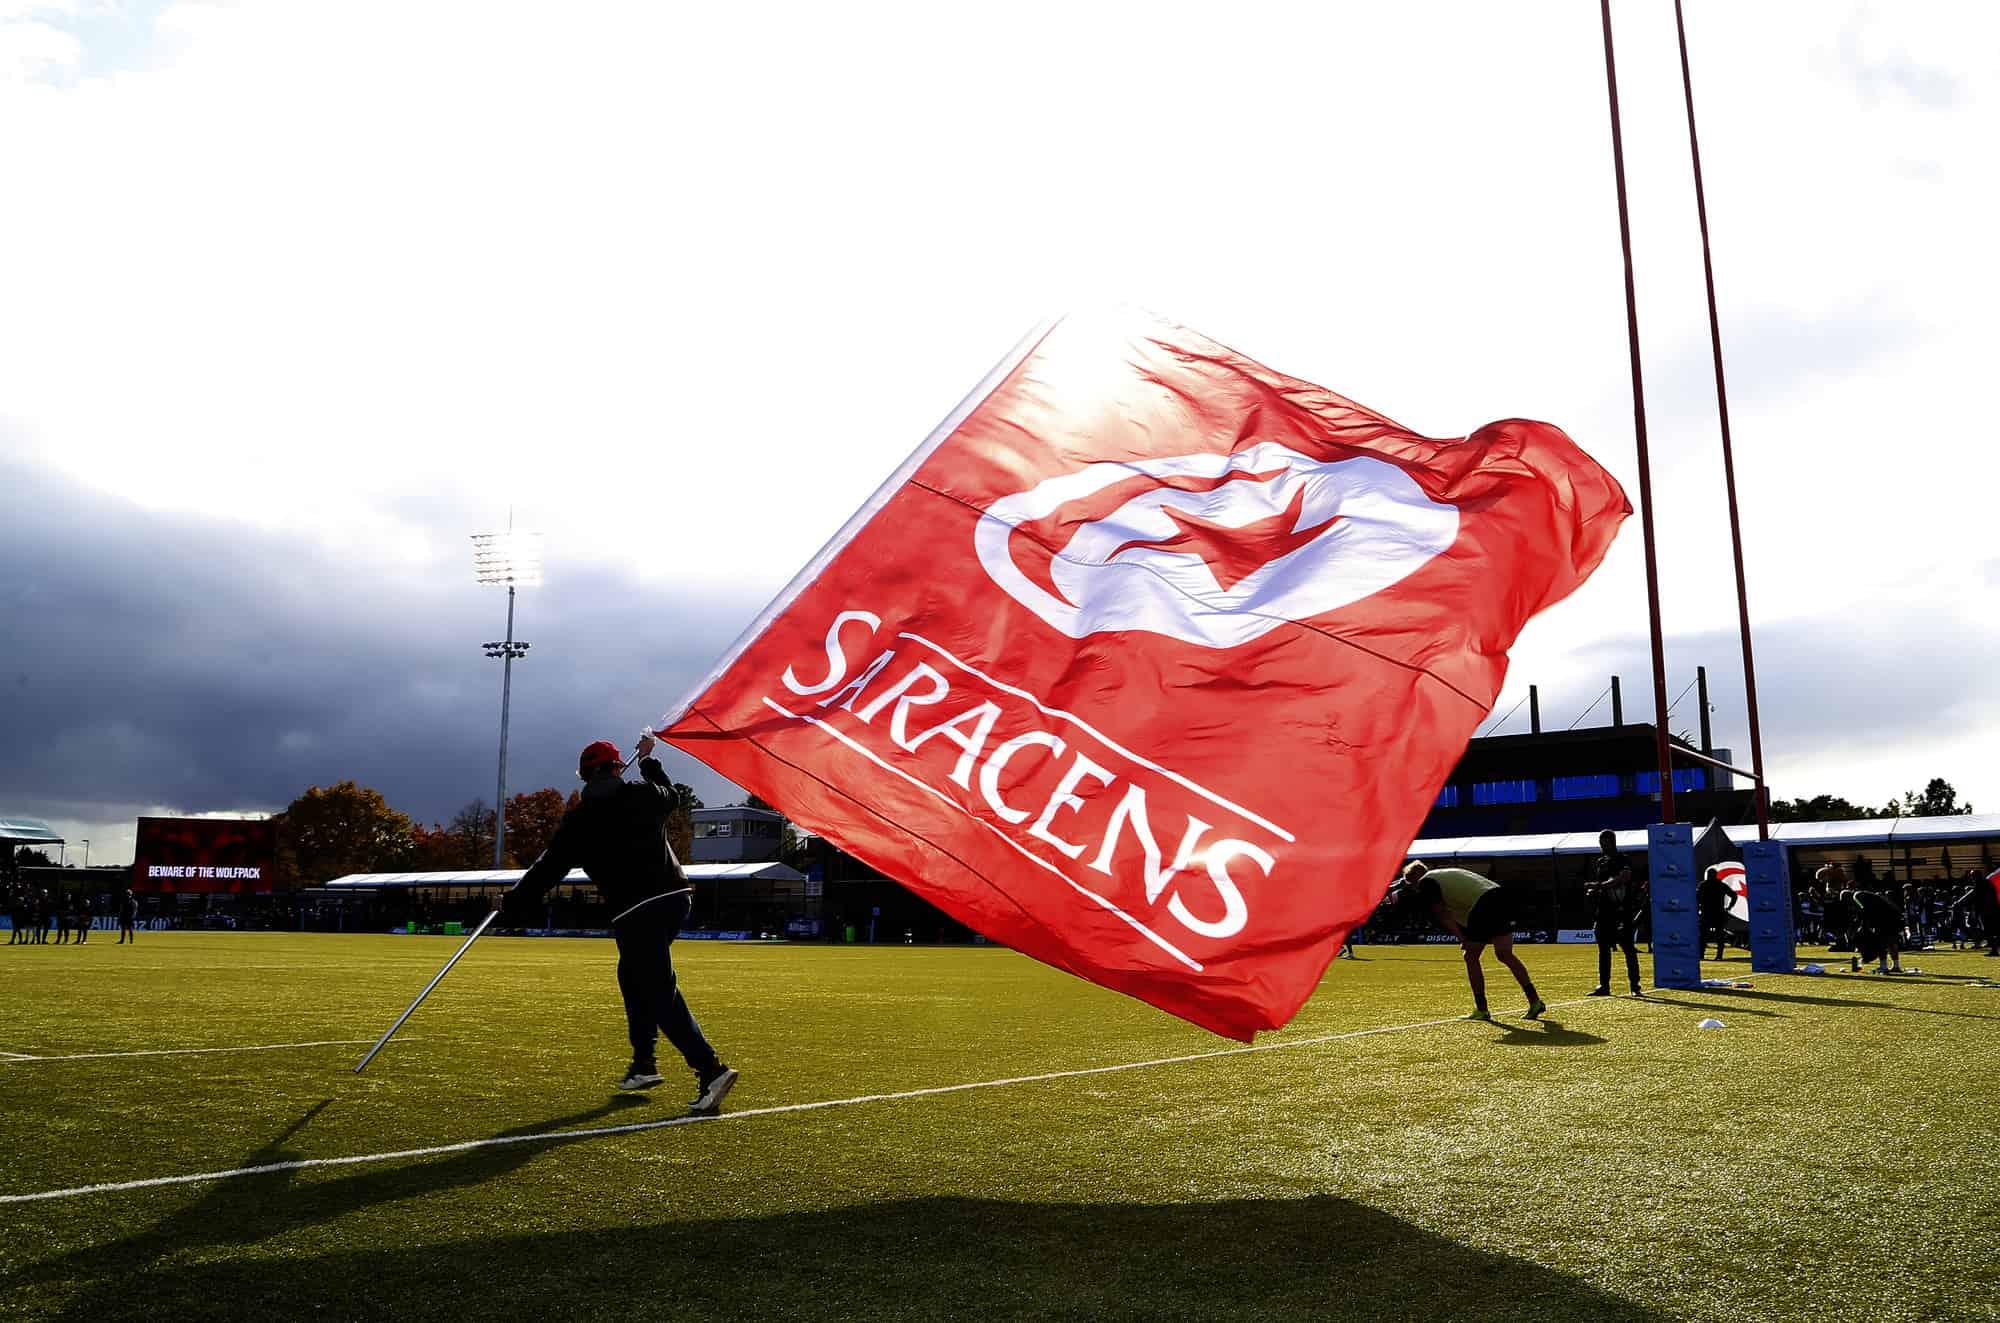 Saracens v Northampton SaintsGallagher Premiership